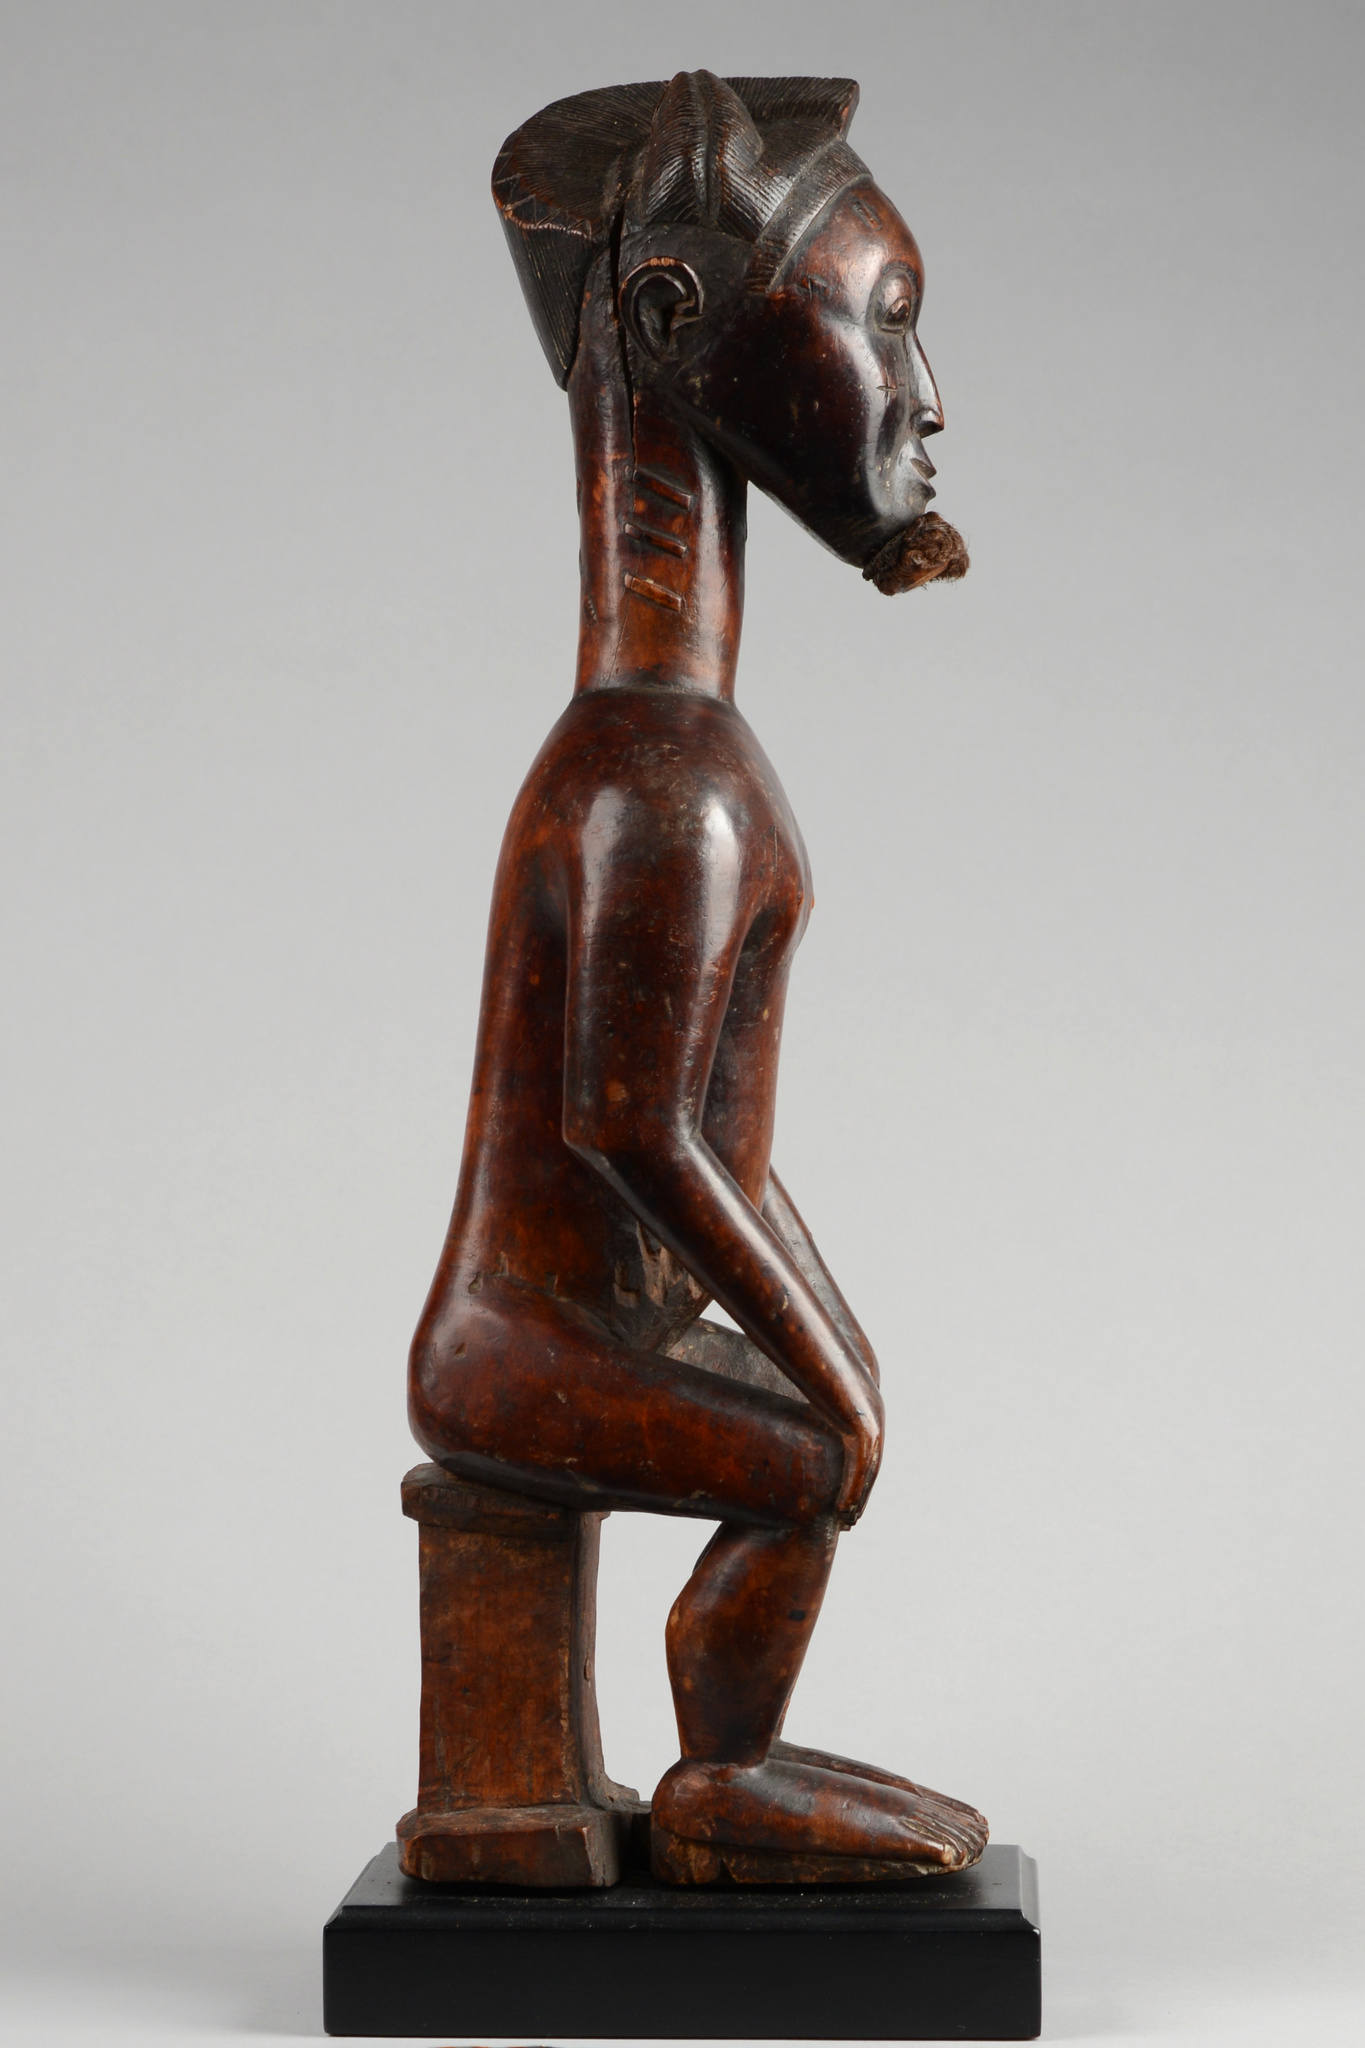 Sitting male figure